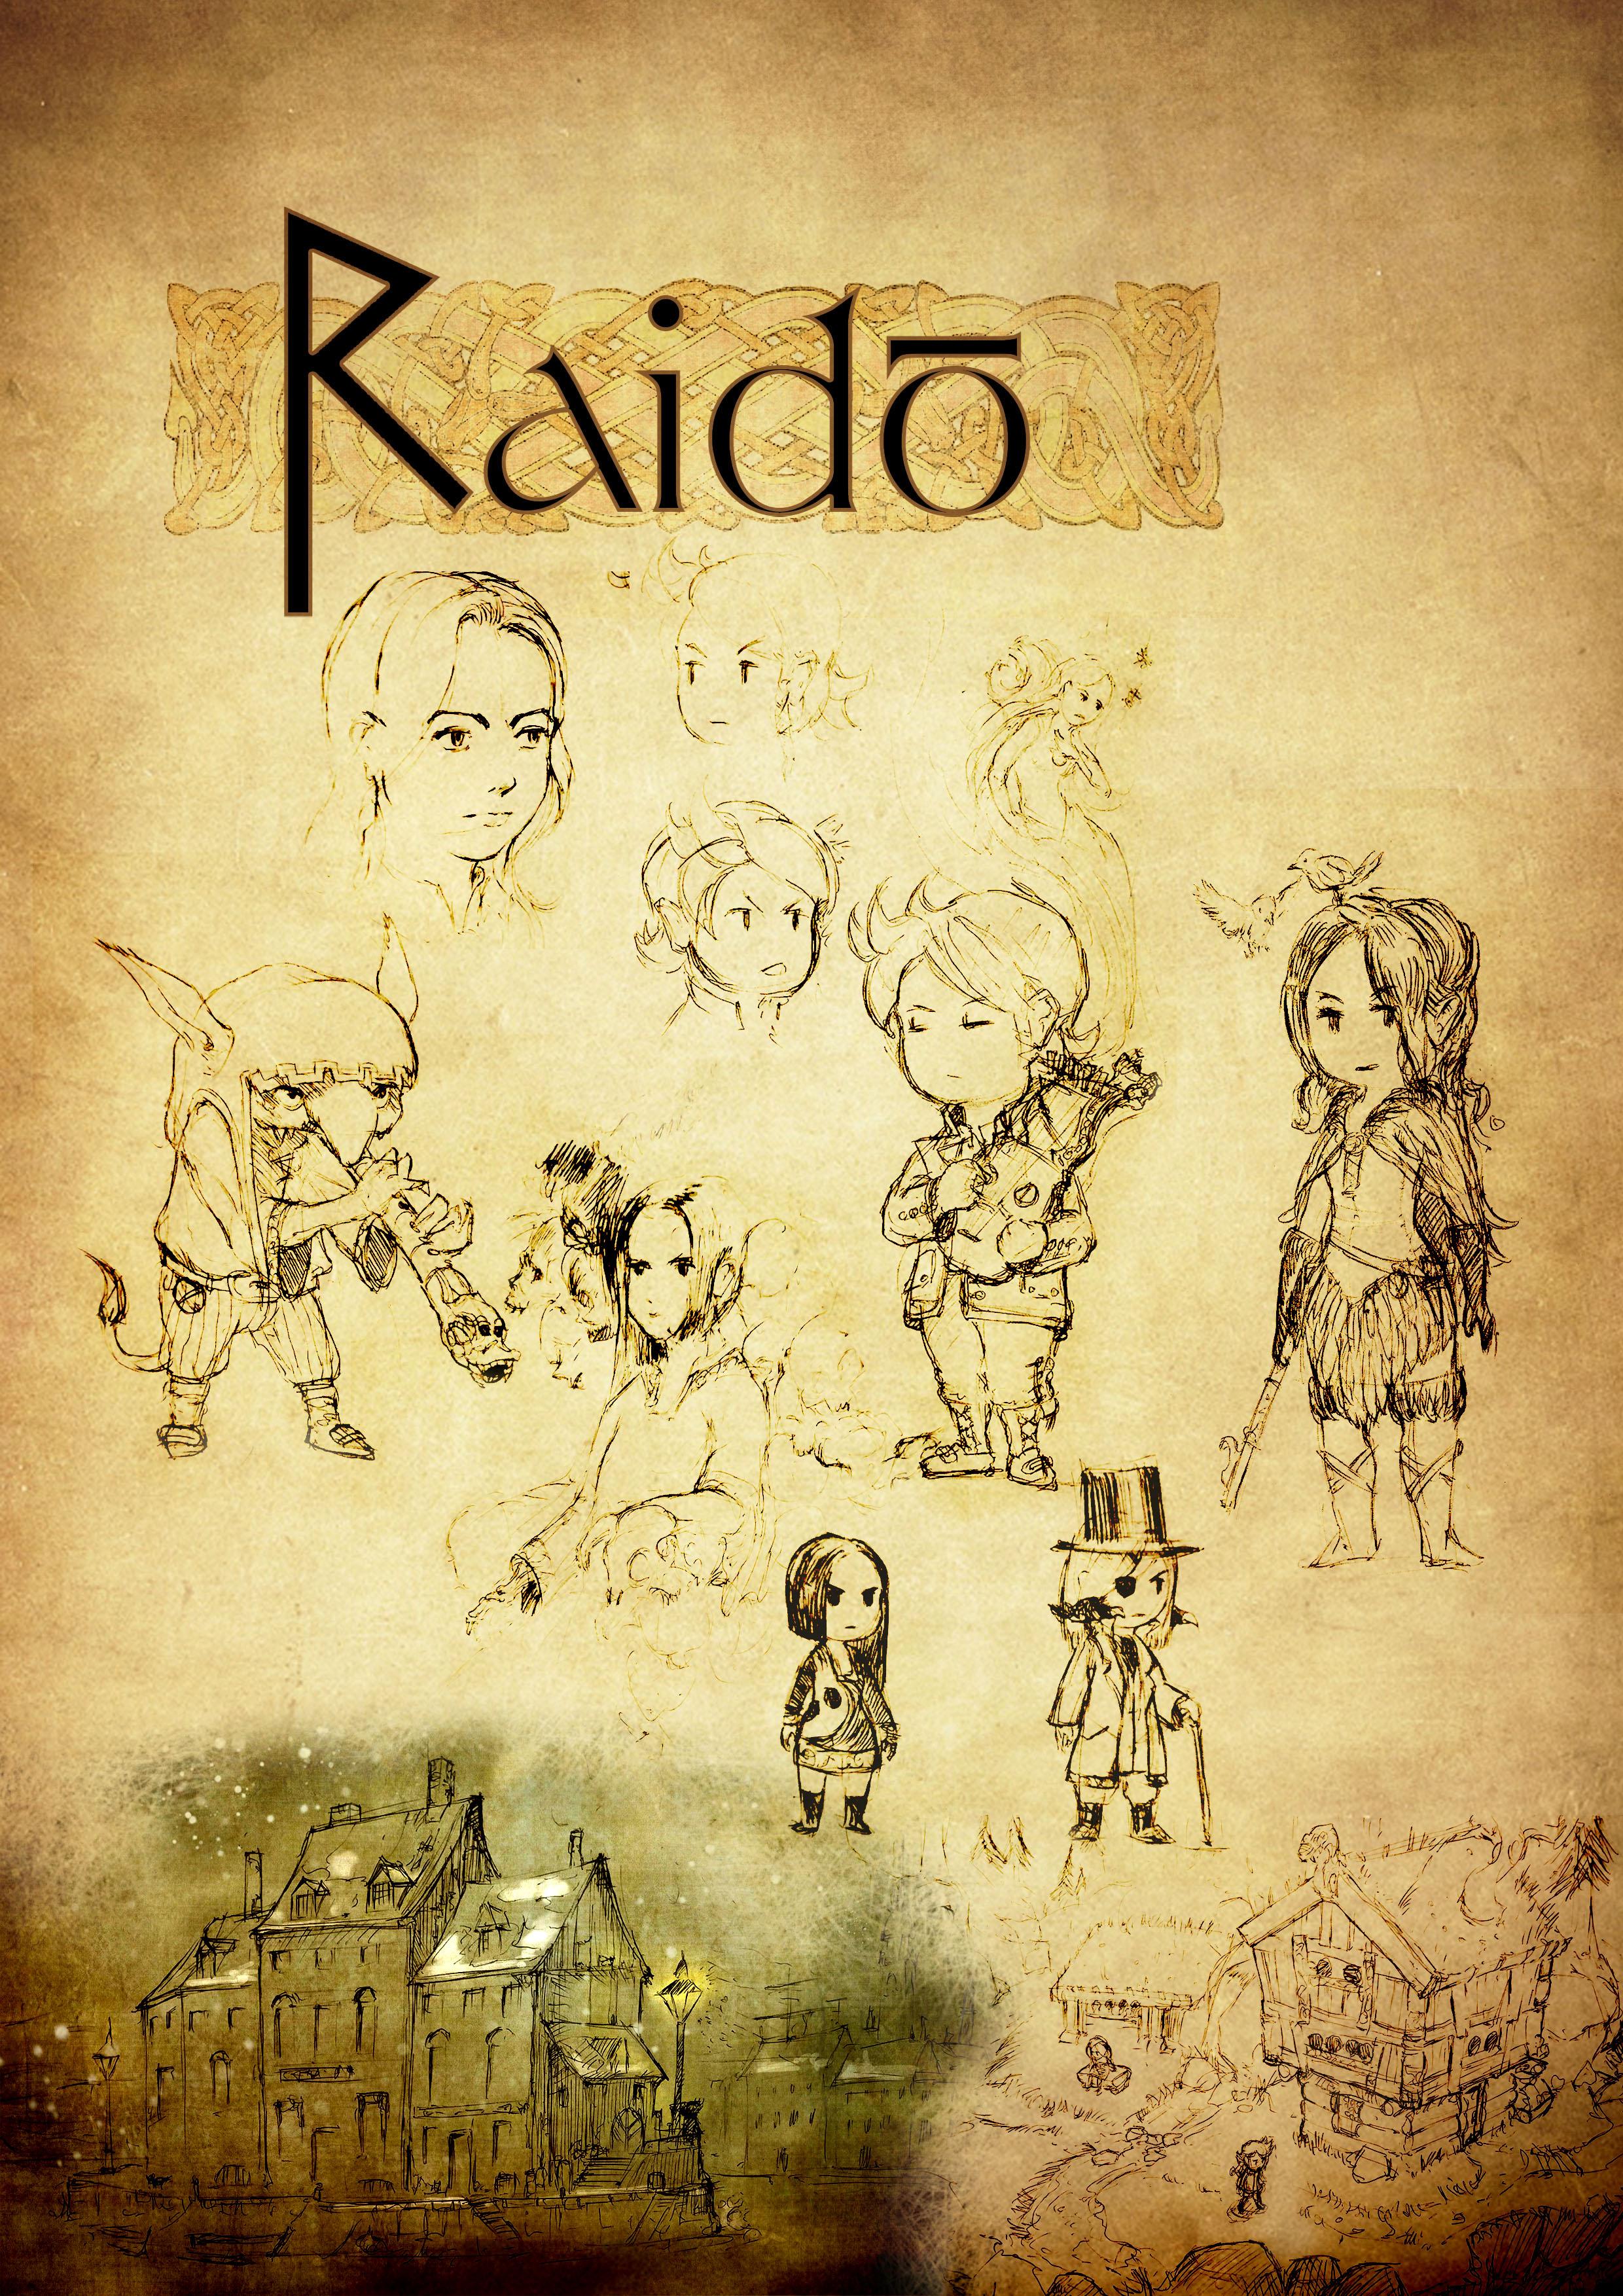 Raido - JRPG Musical concept - Gaphic Bible by Pierre Etienne Travers.jpg